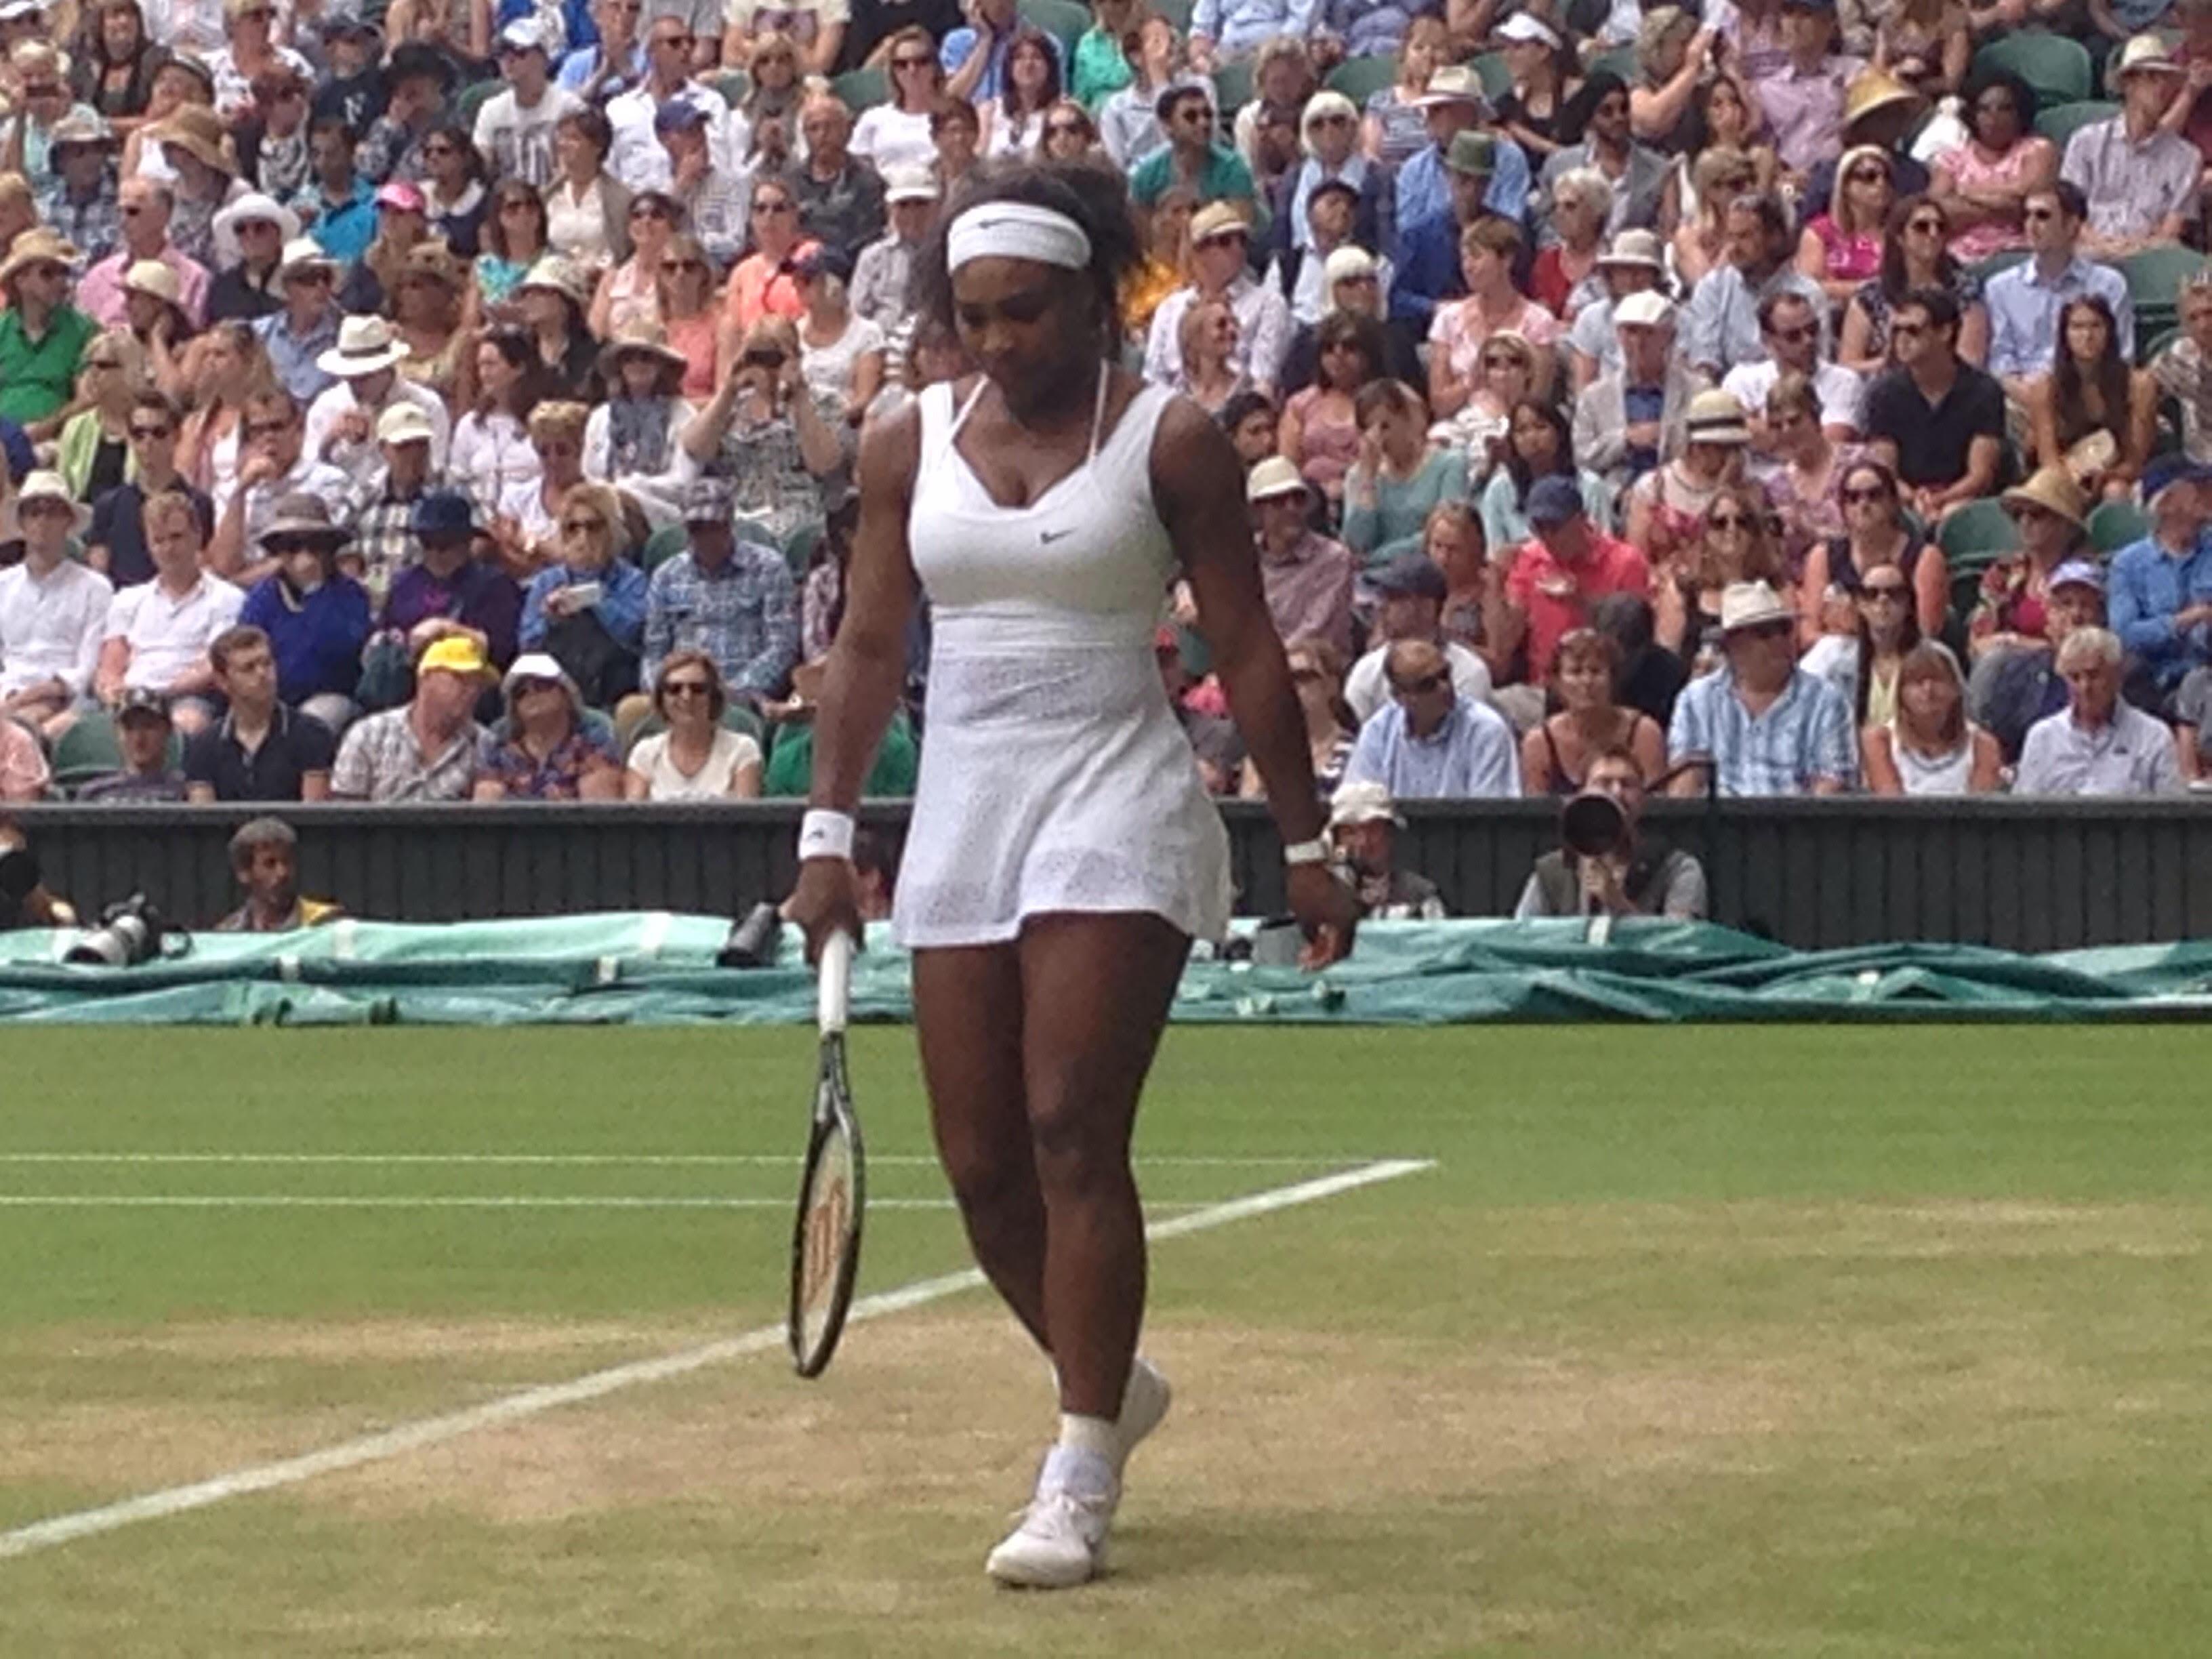 Serena Williams, Center Court, Wimbledon 2015